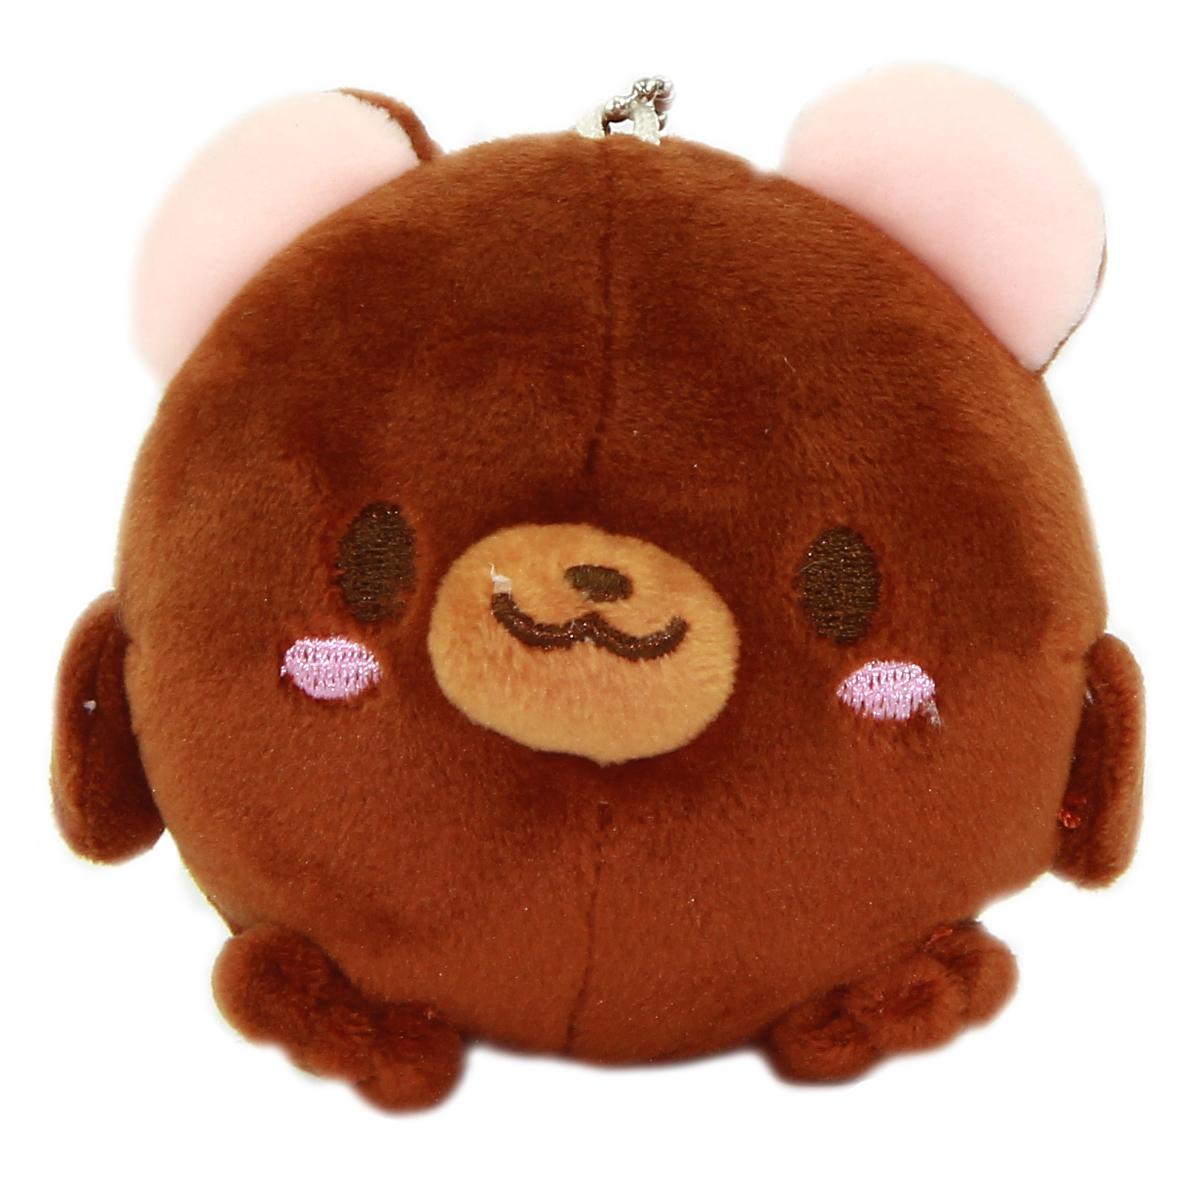 Bear Plush Doll Kawaii Stuffed Animal Soft Squishy Plushie Mochi Brown